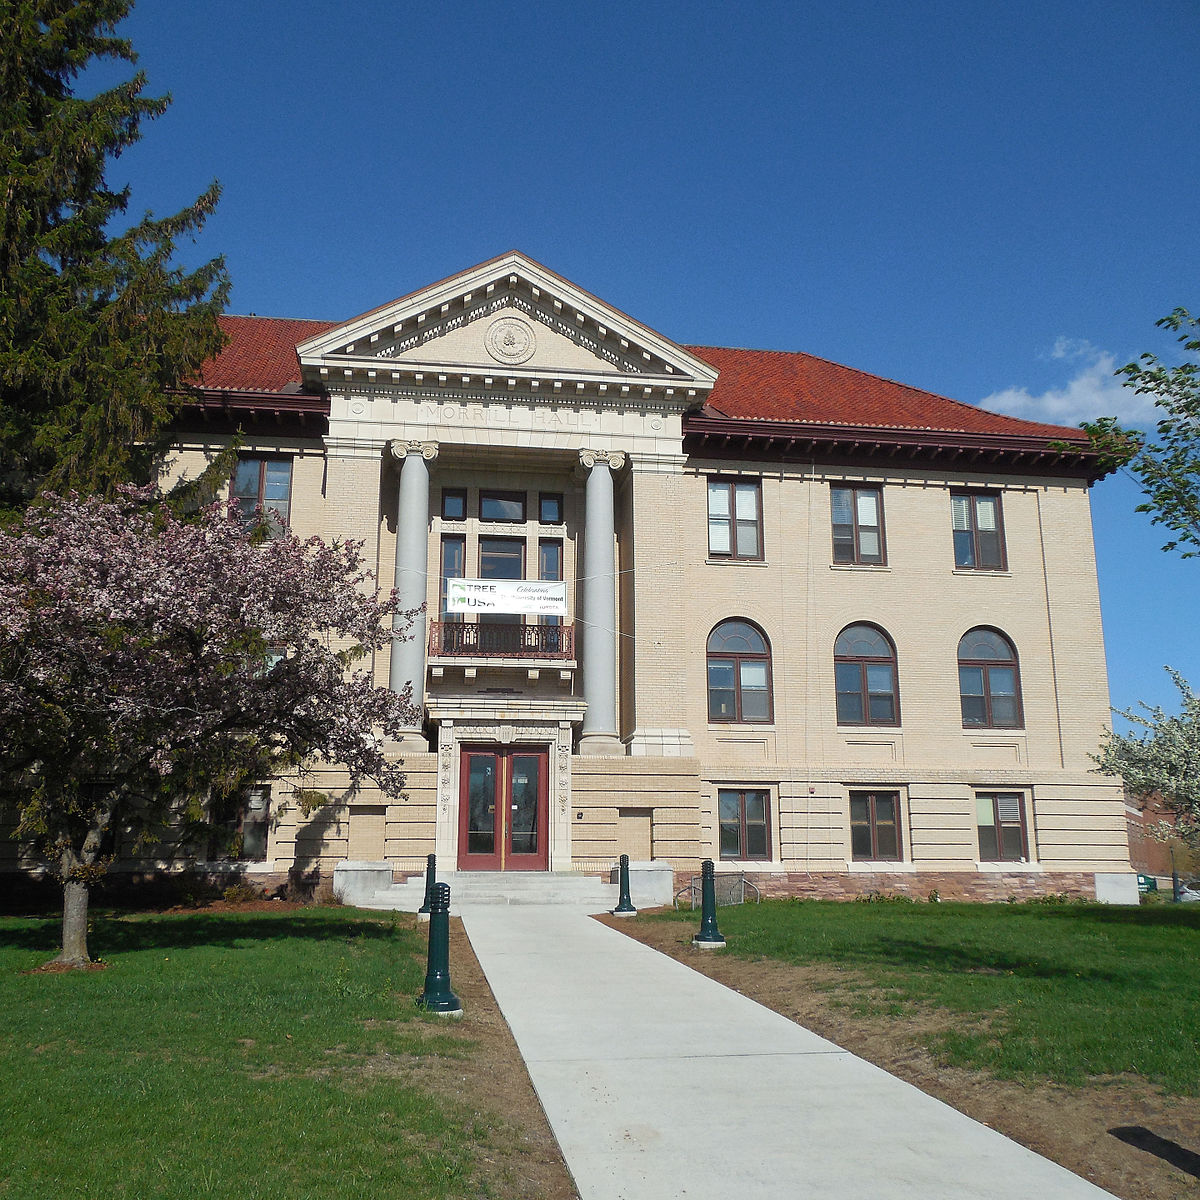 Morrill Hall (University of Vermont) - Wikipedia